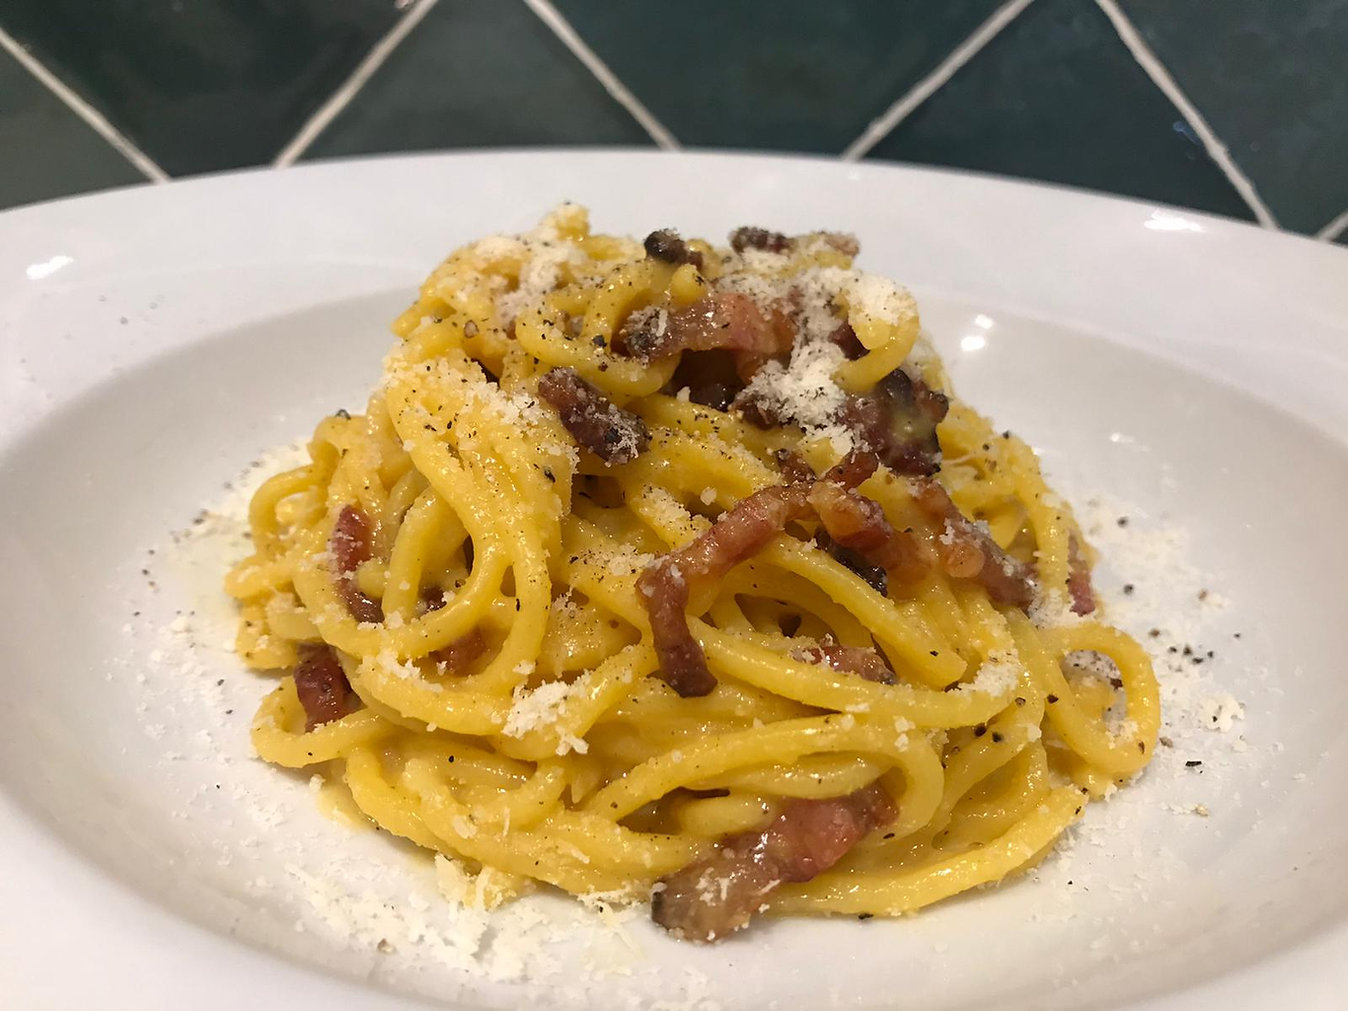 Matteo Cucina Italiana pedidos online (Restaurante) - GastroMadrid